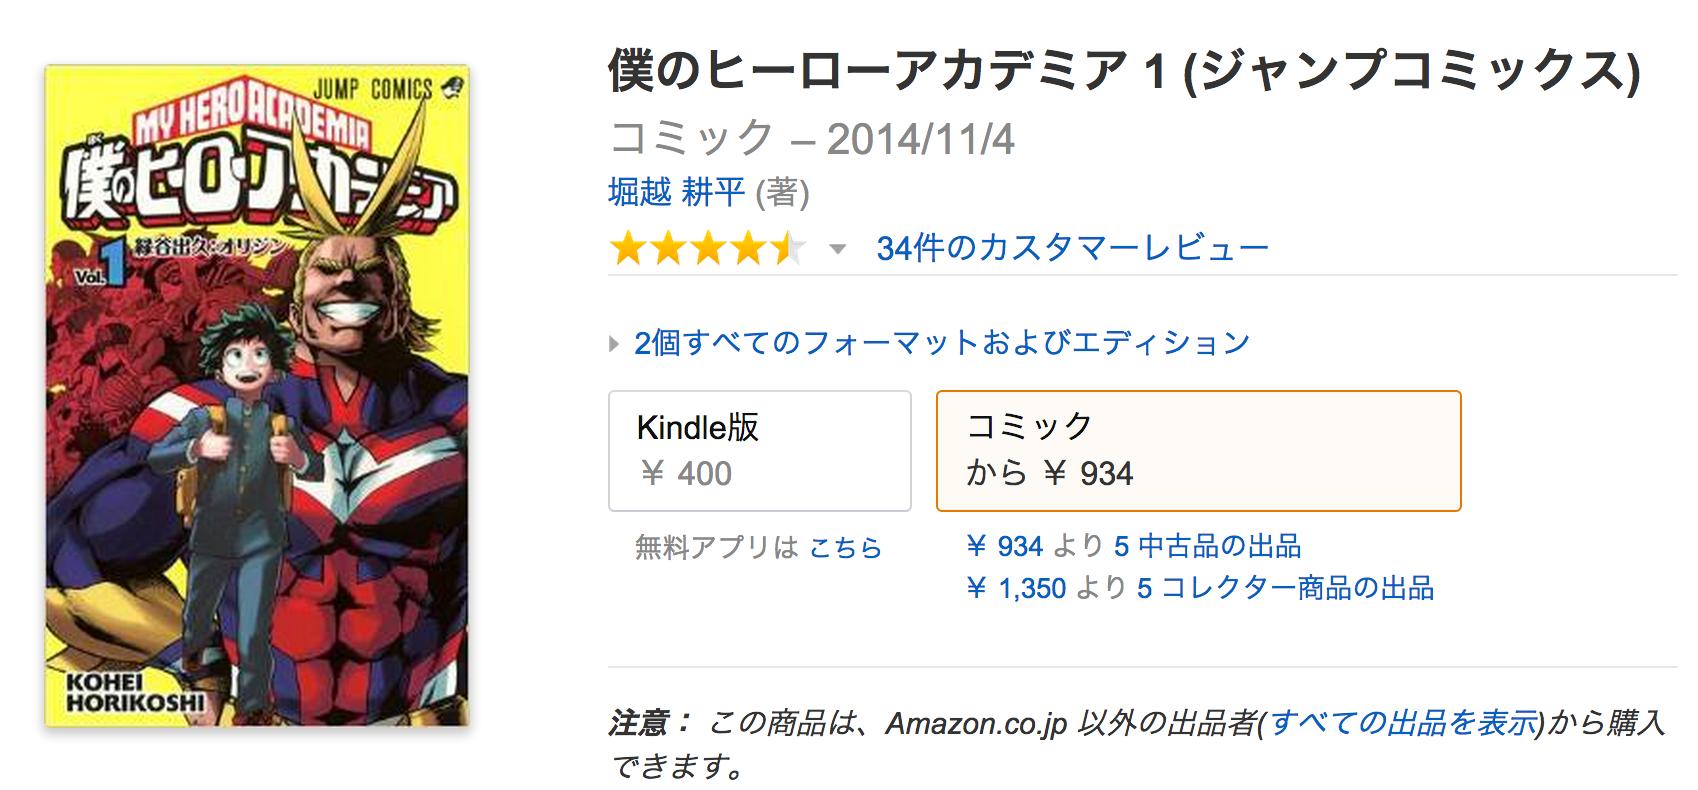 Amazon_co_jp:_僕のヒーローアカデミア_1__ジャンプコミックス___堀越_耕平__本